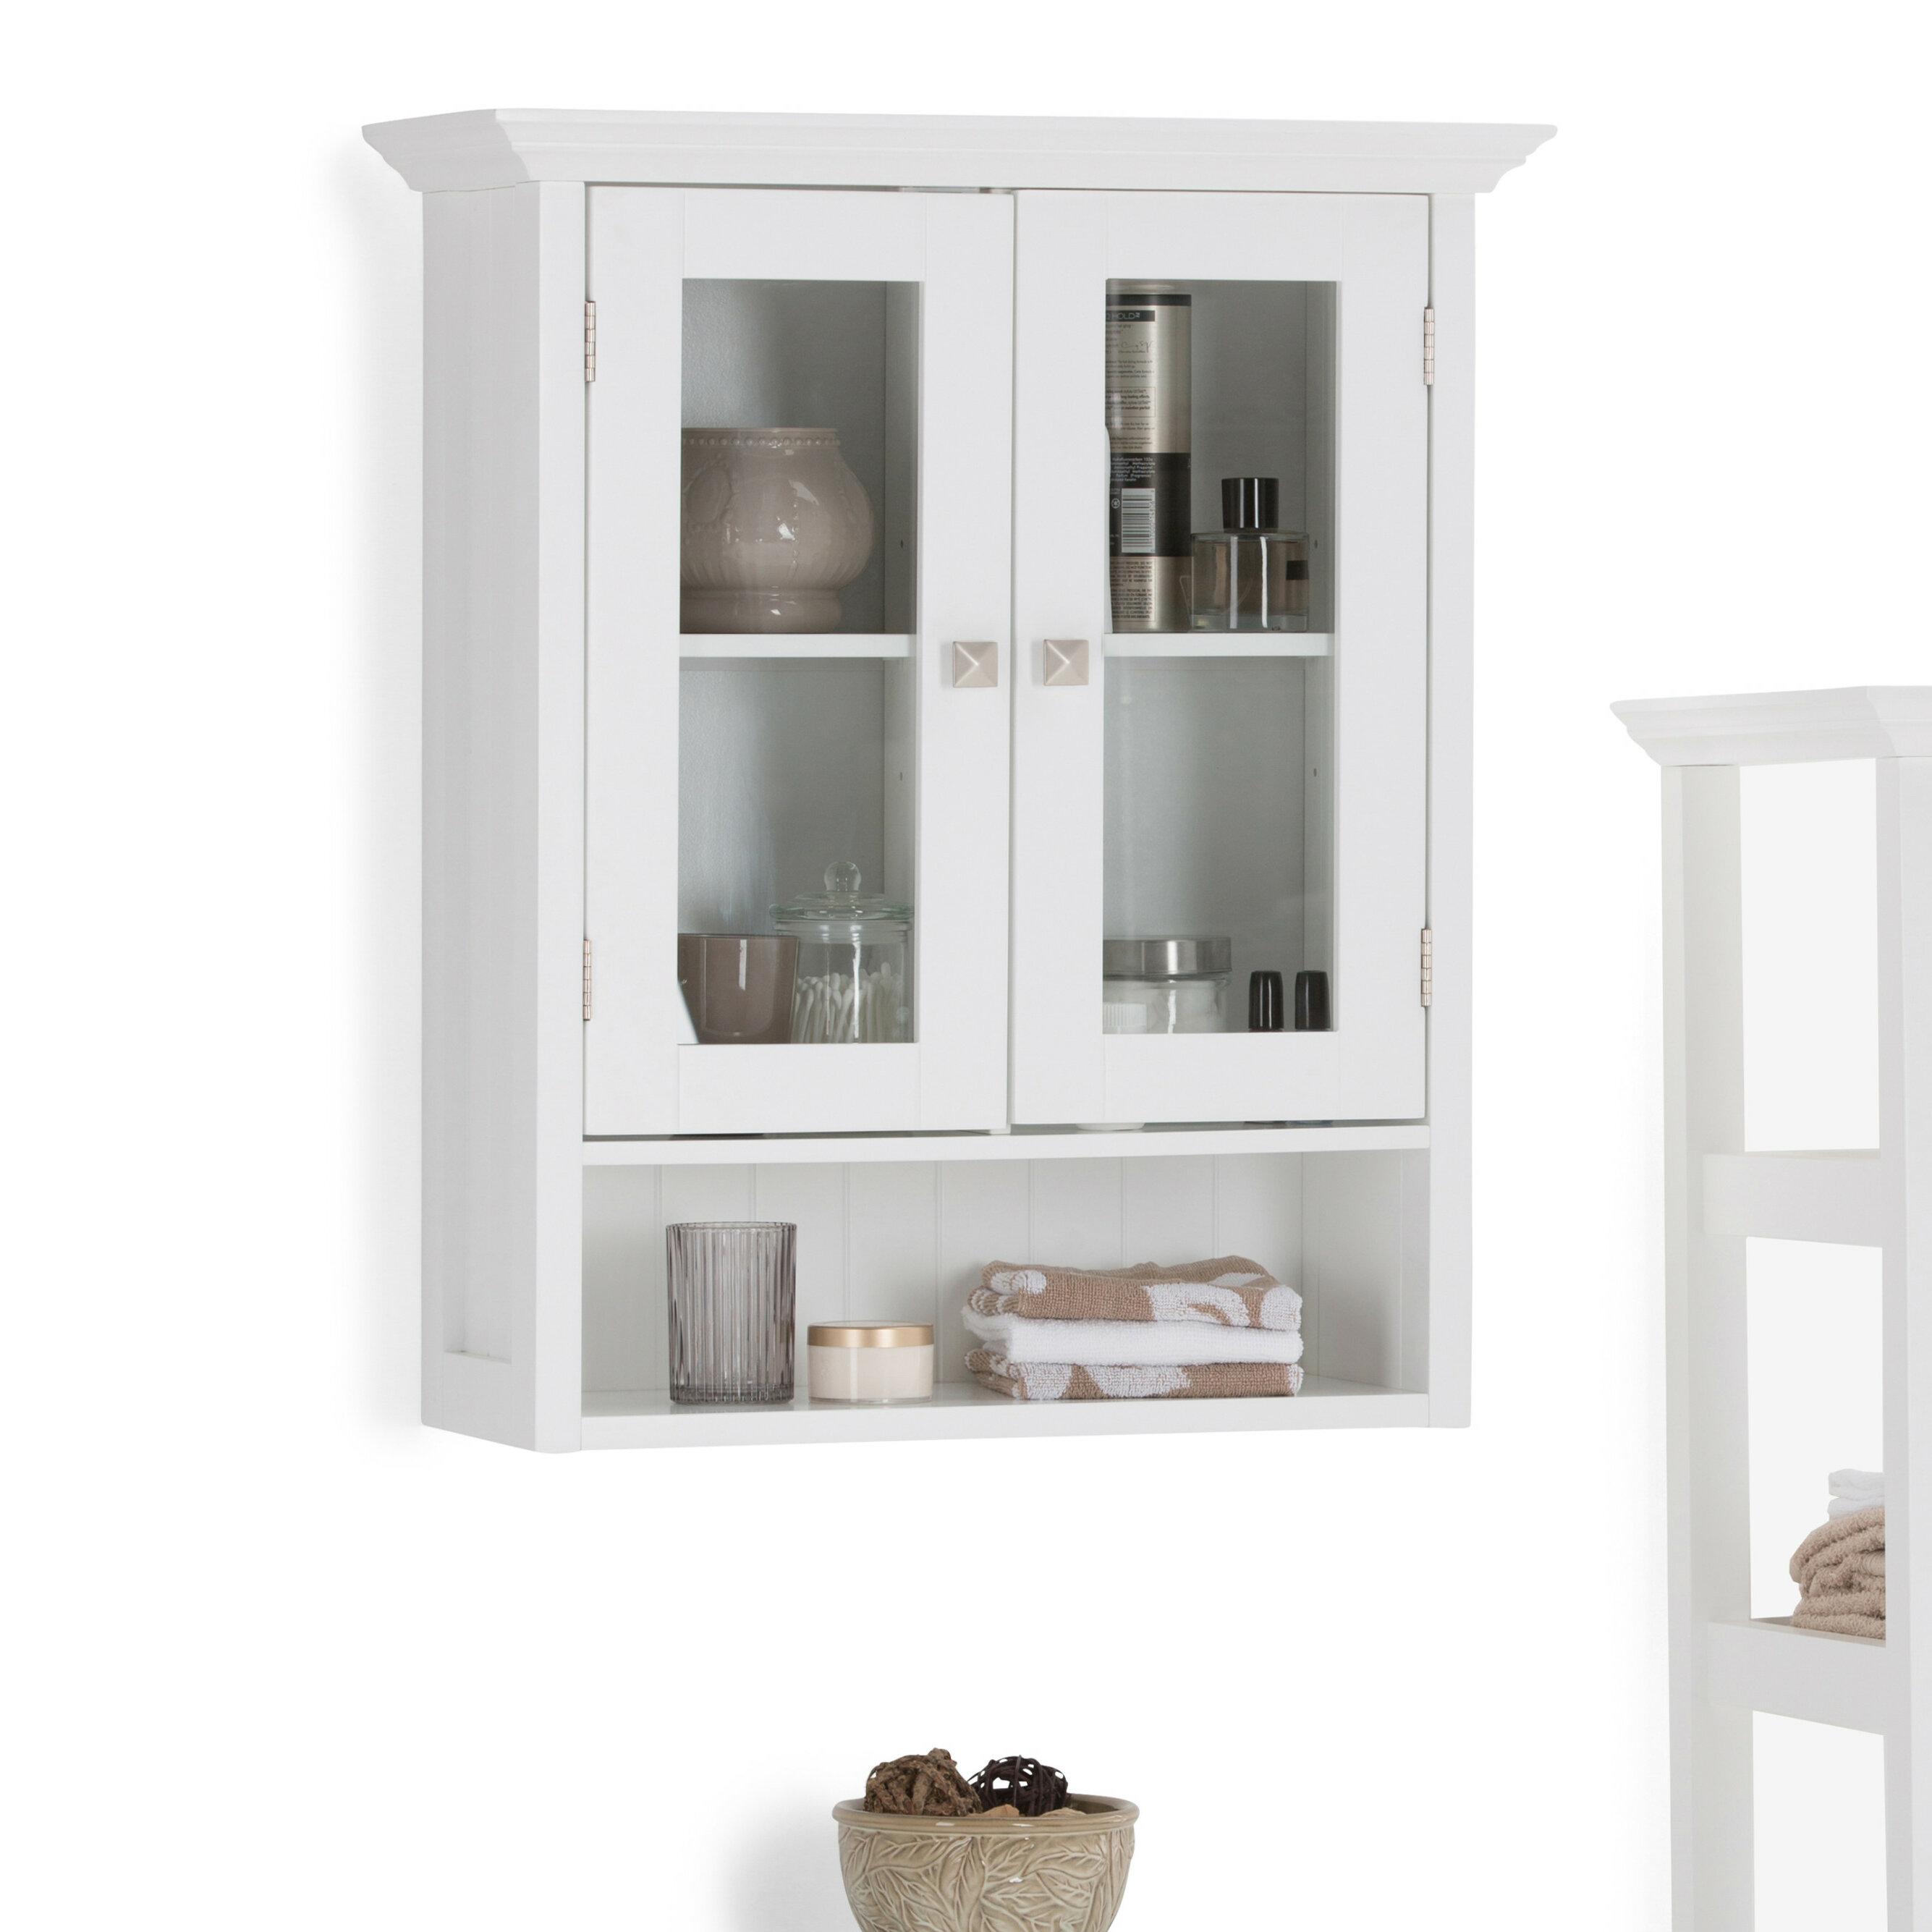 simpli home acadian double door 23 63 w x 27 96 h wall mounted